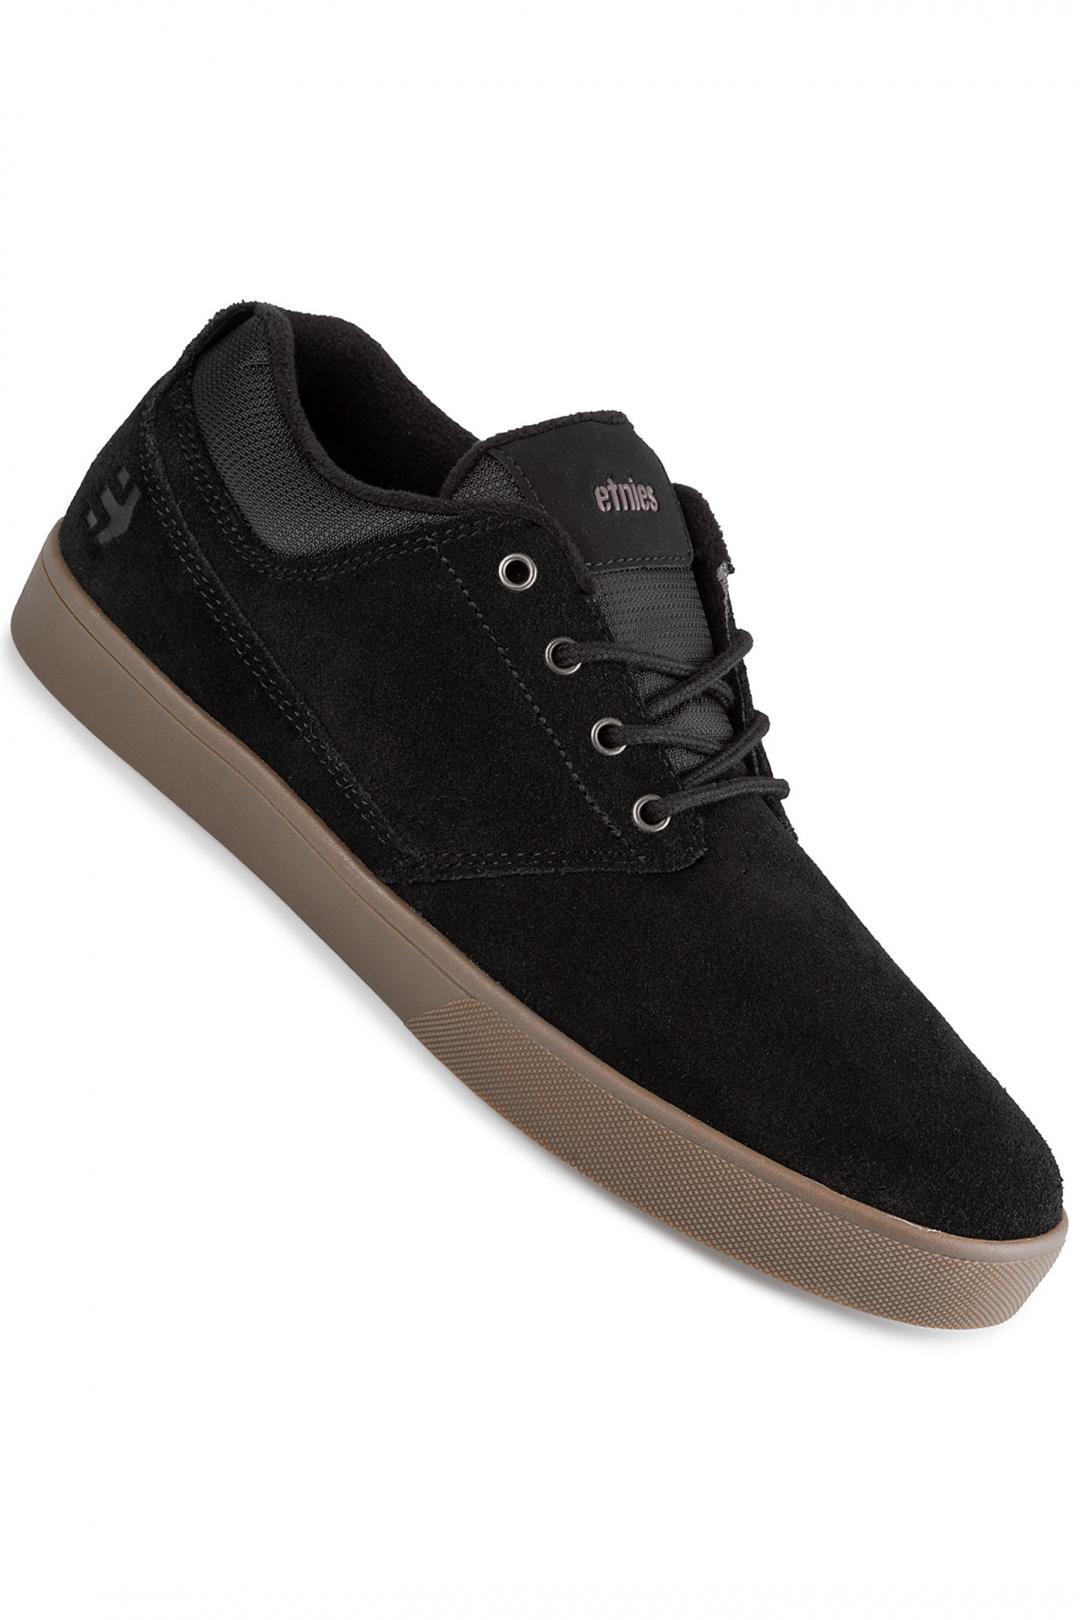 Uomo Etnies Jameson MT black black gum | Sneakers mid top